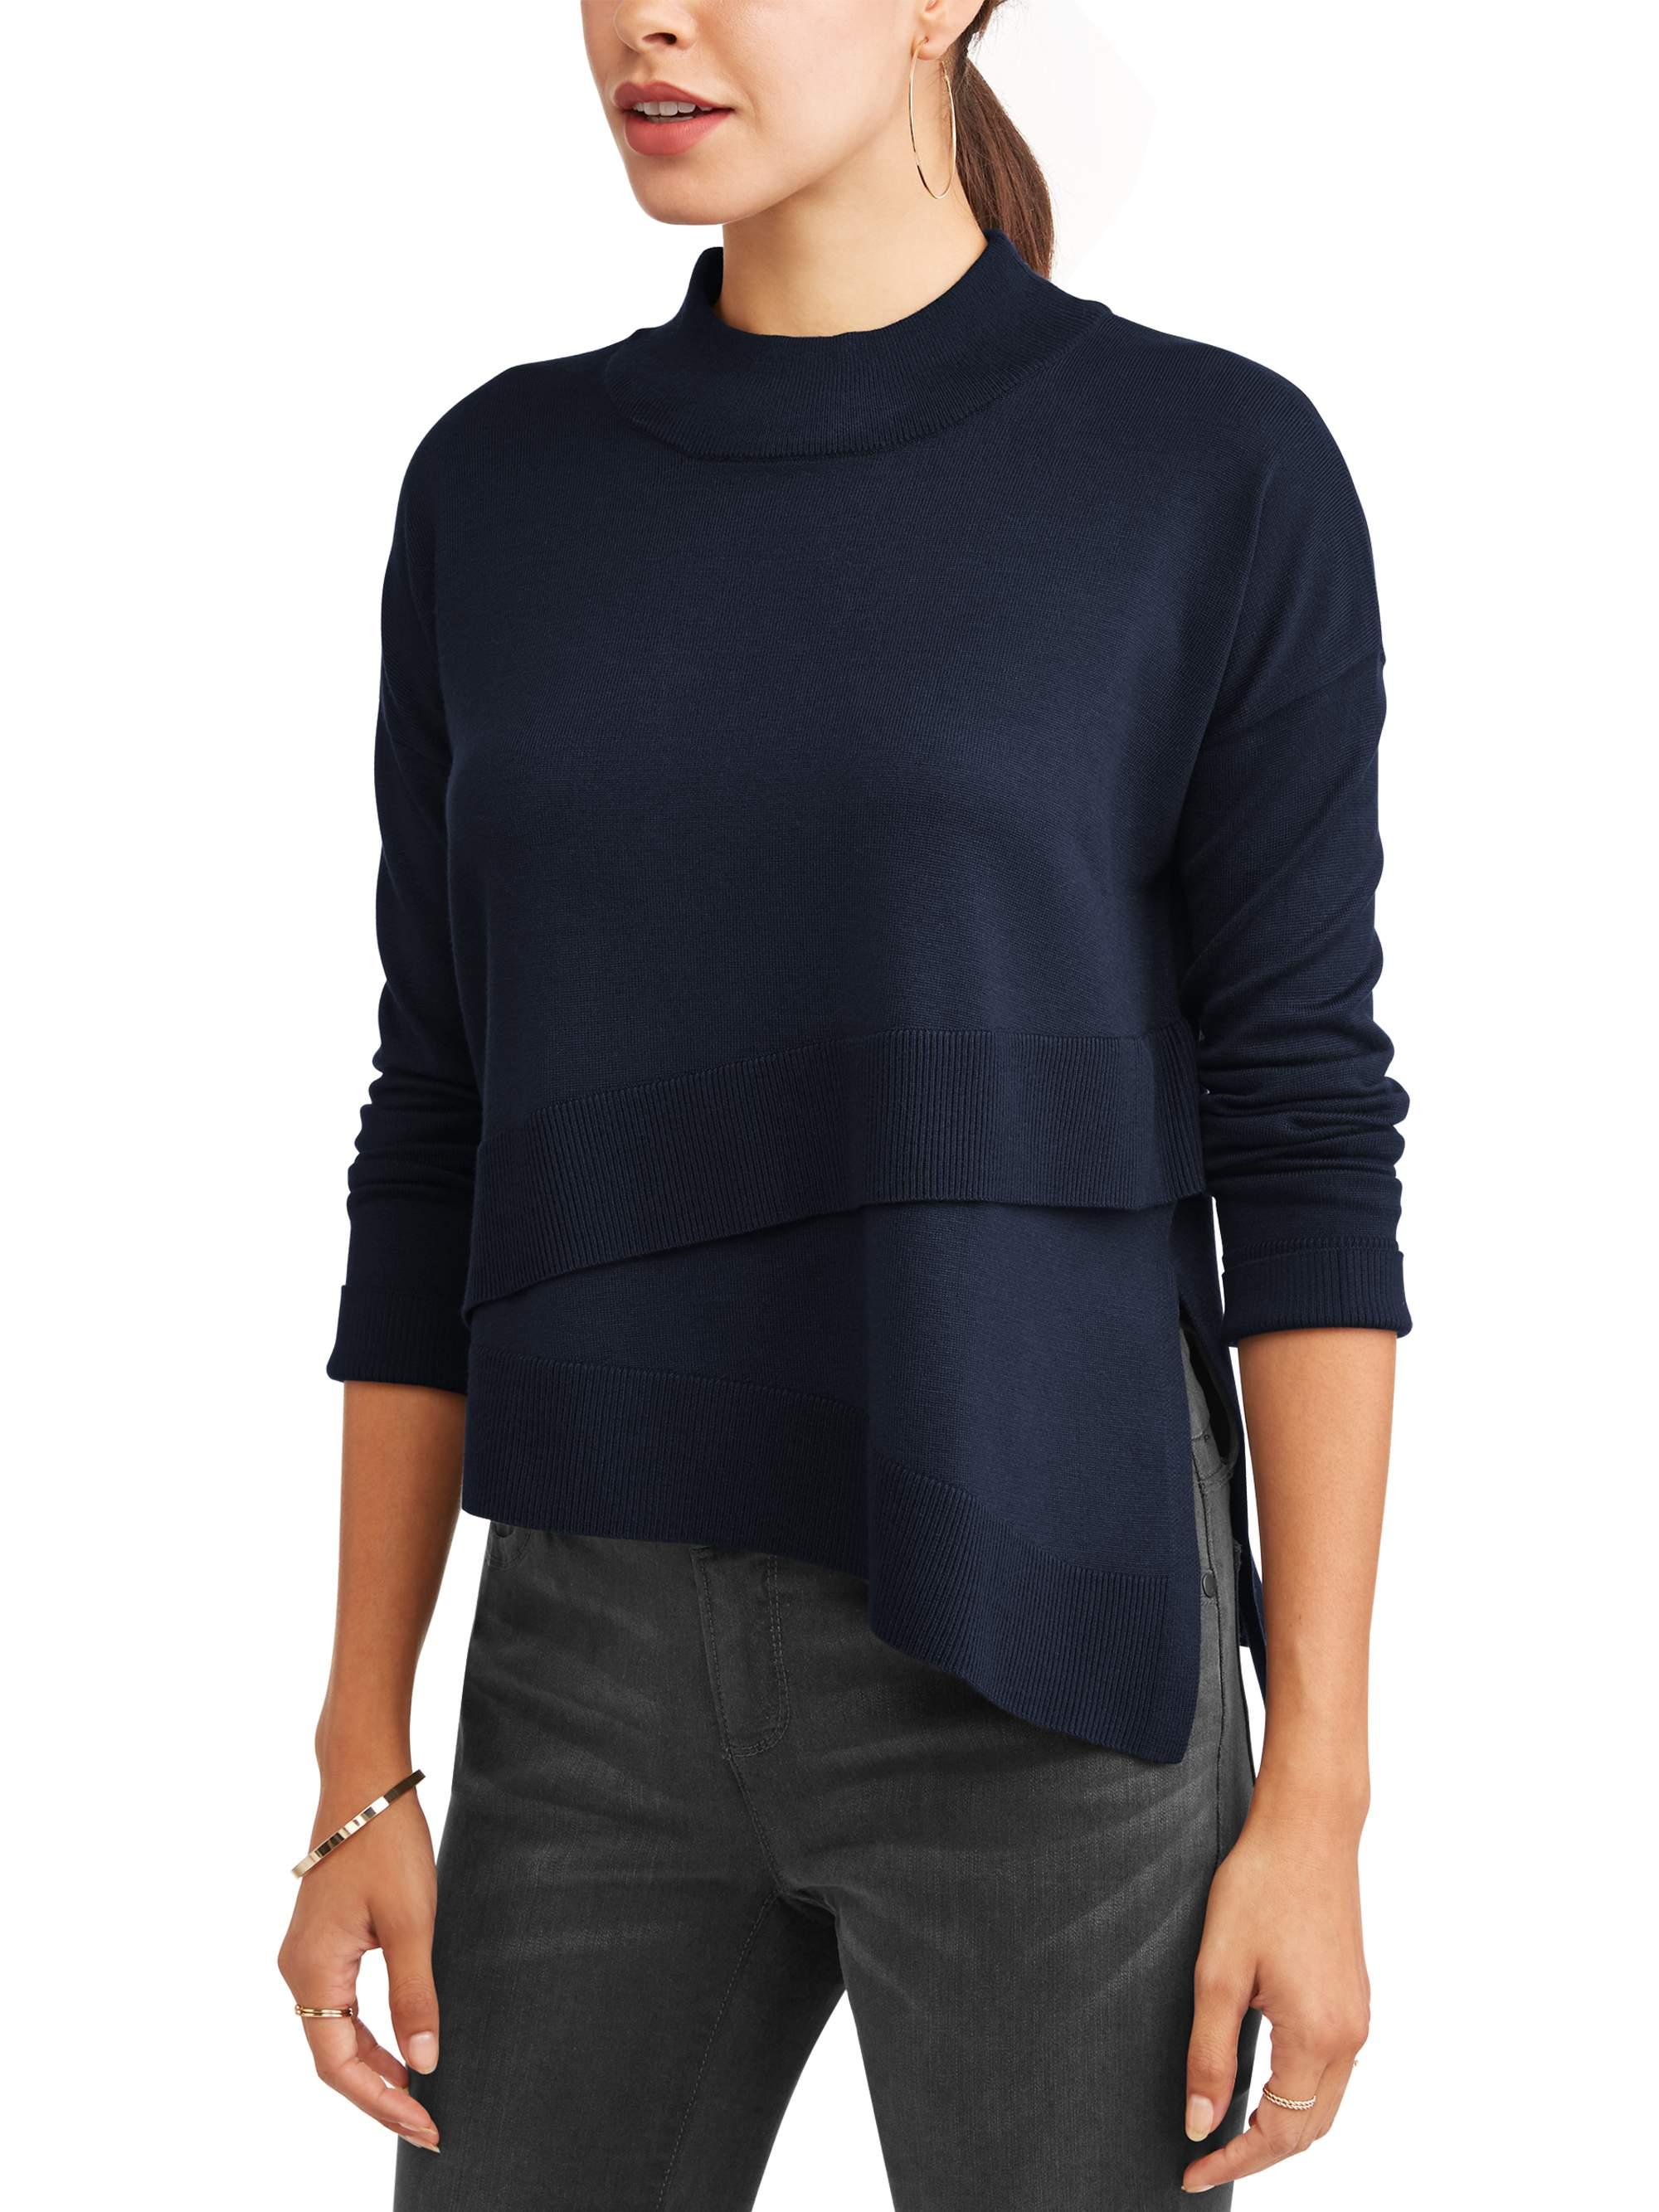 Heart N Crush Women's Layered Front Mock Neck Sweater